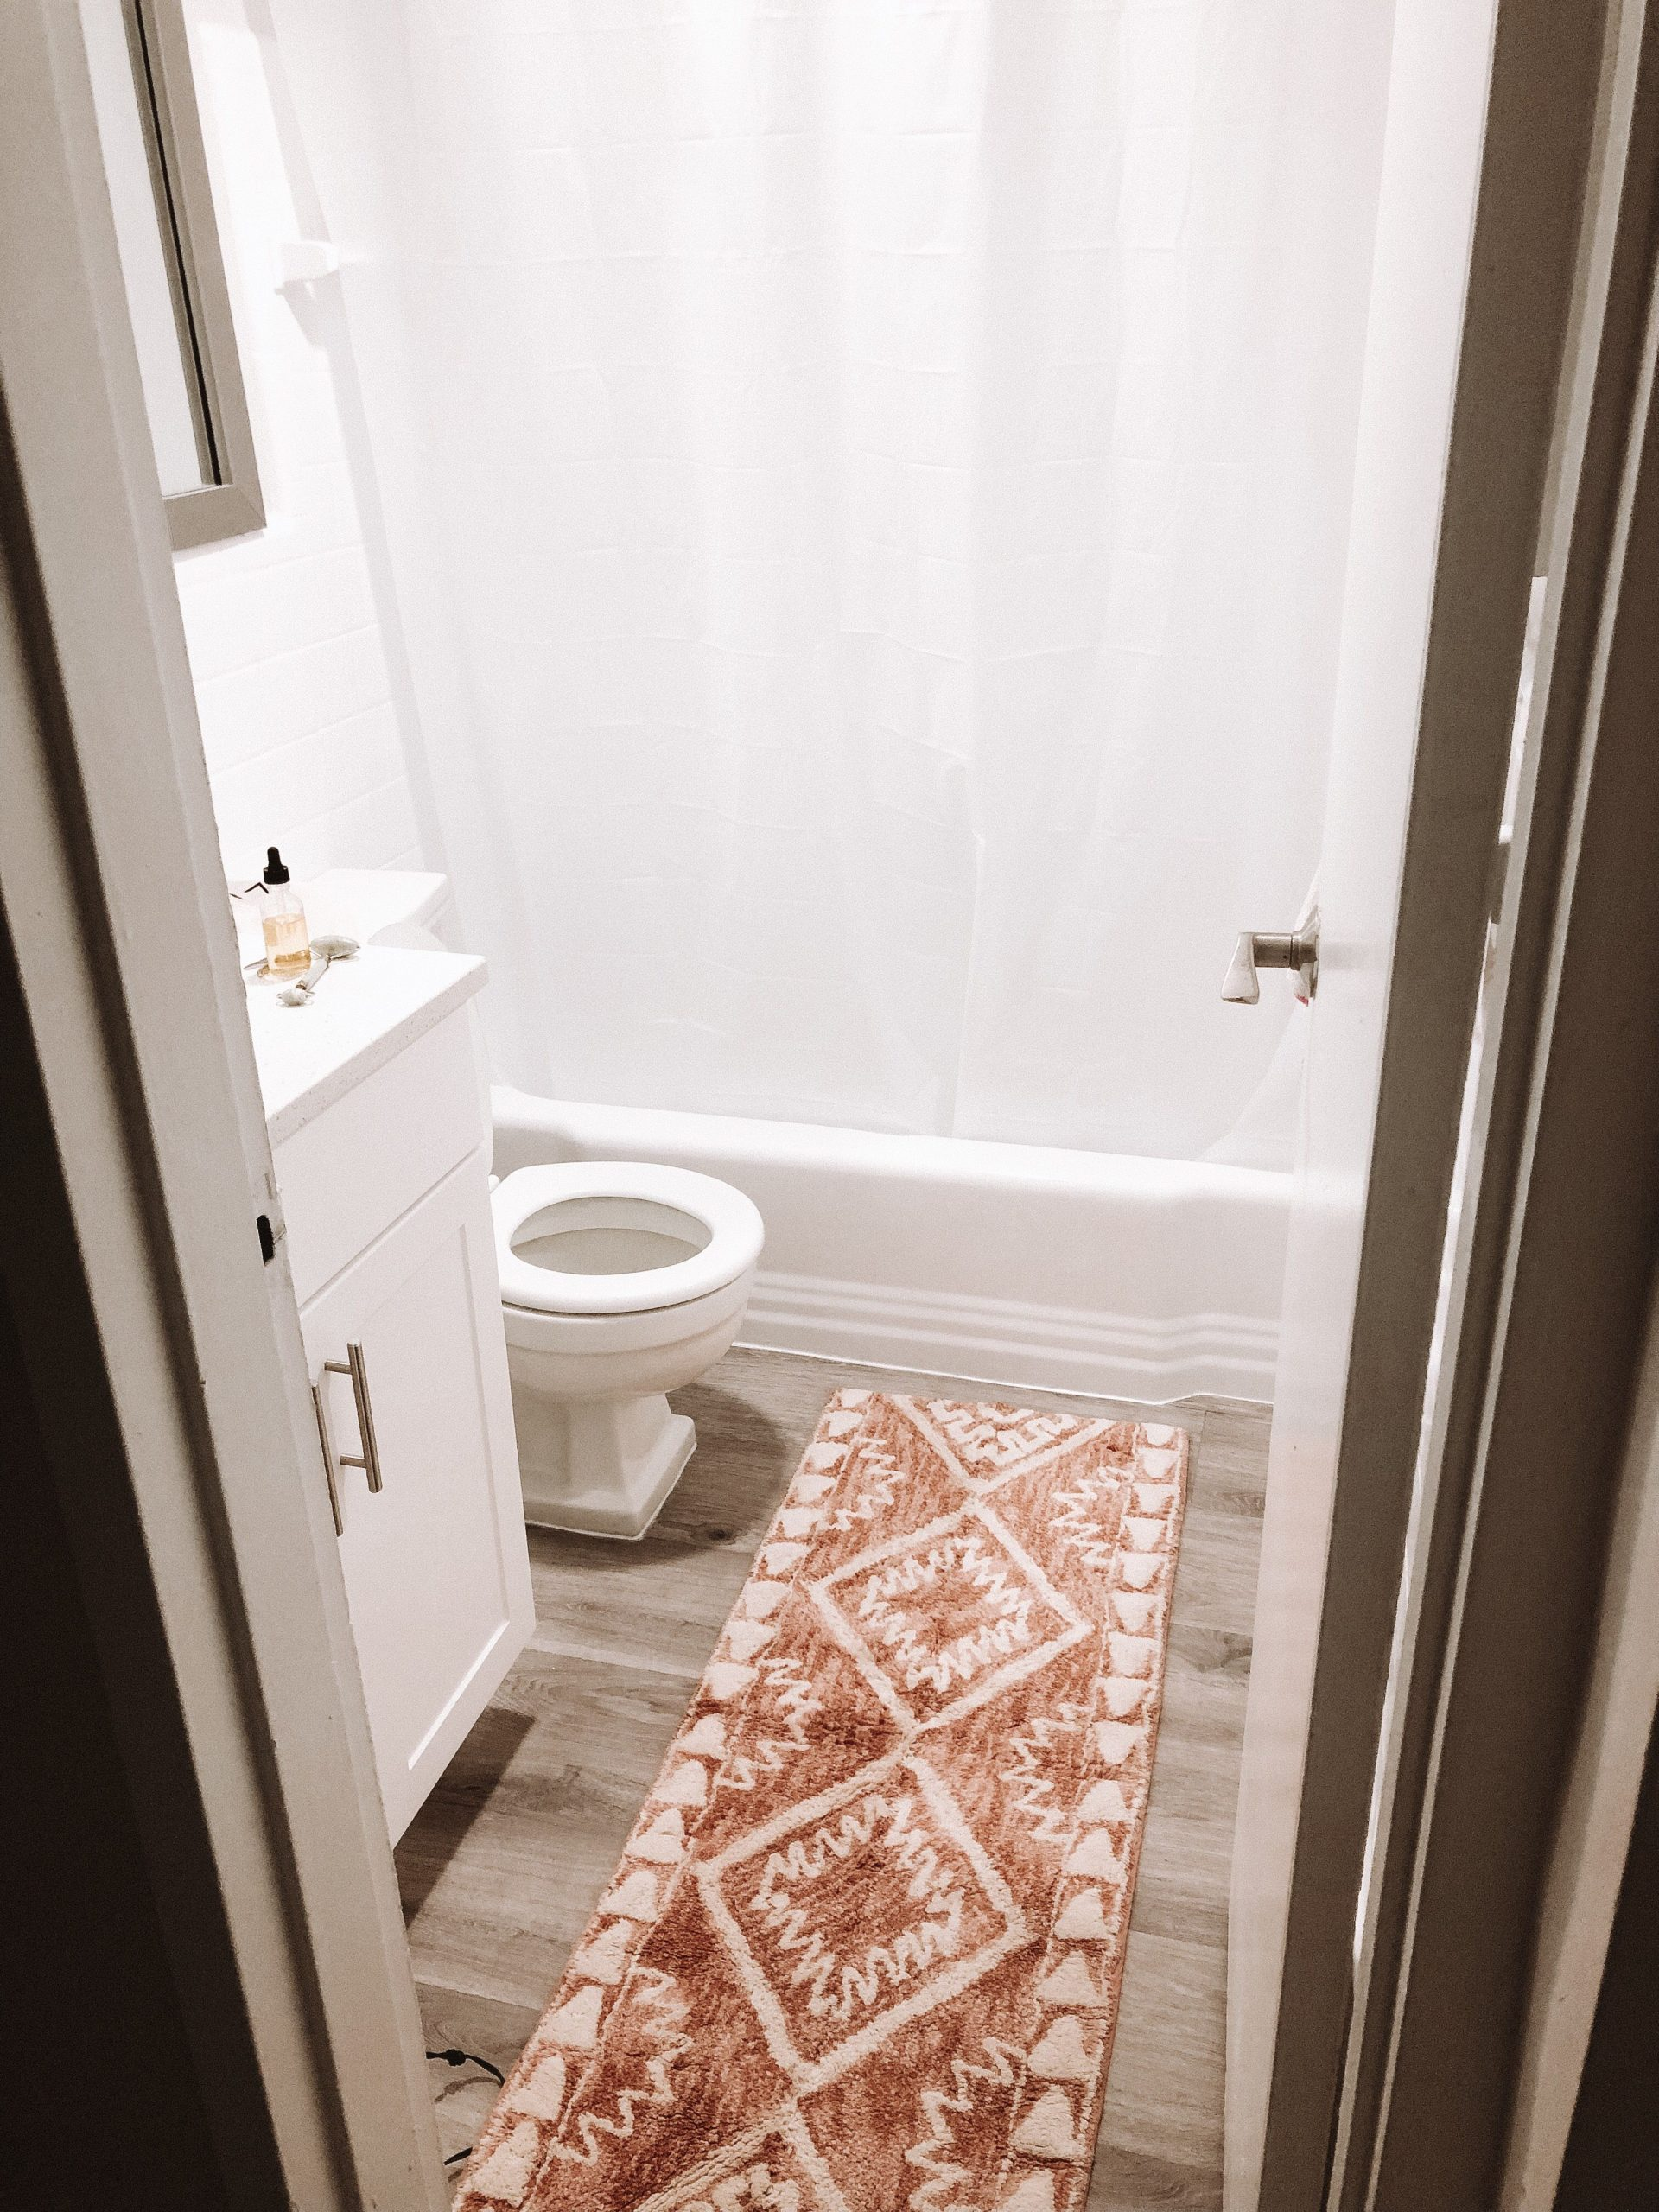 Small Bathroom Rug